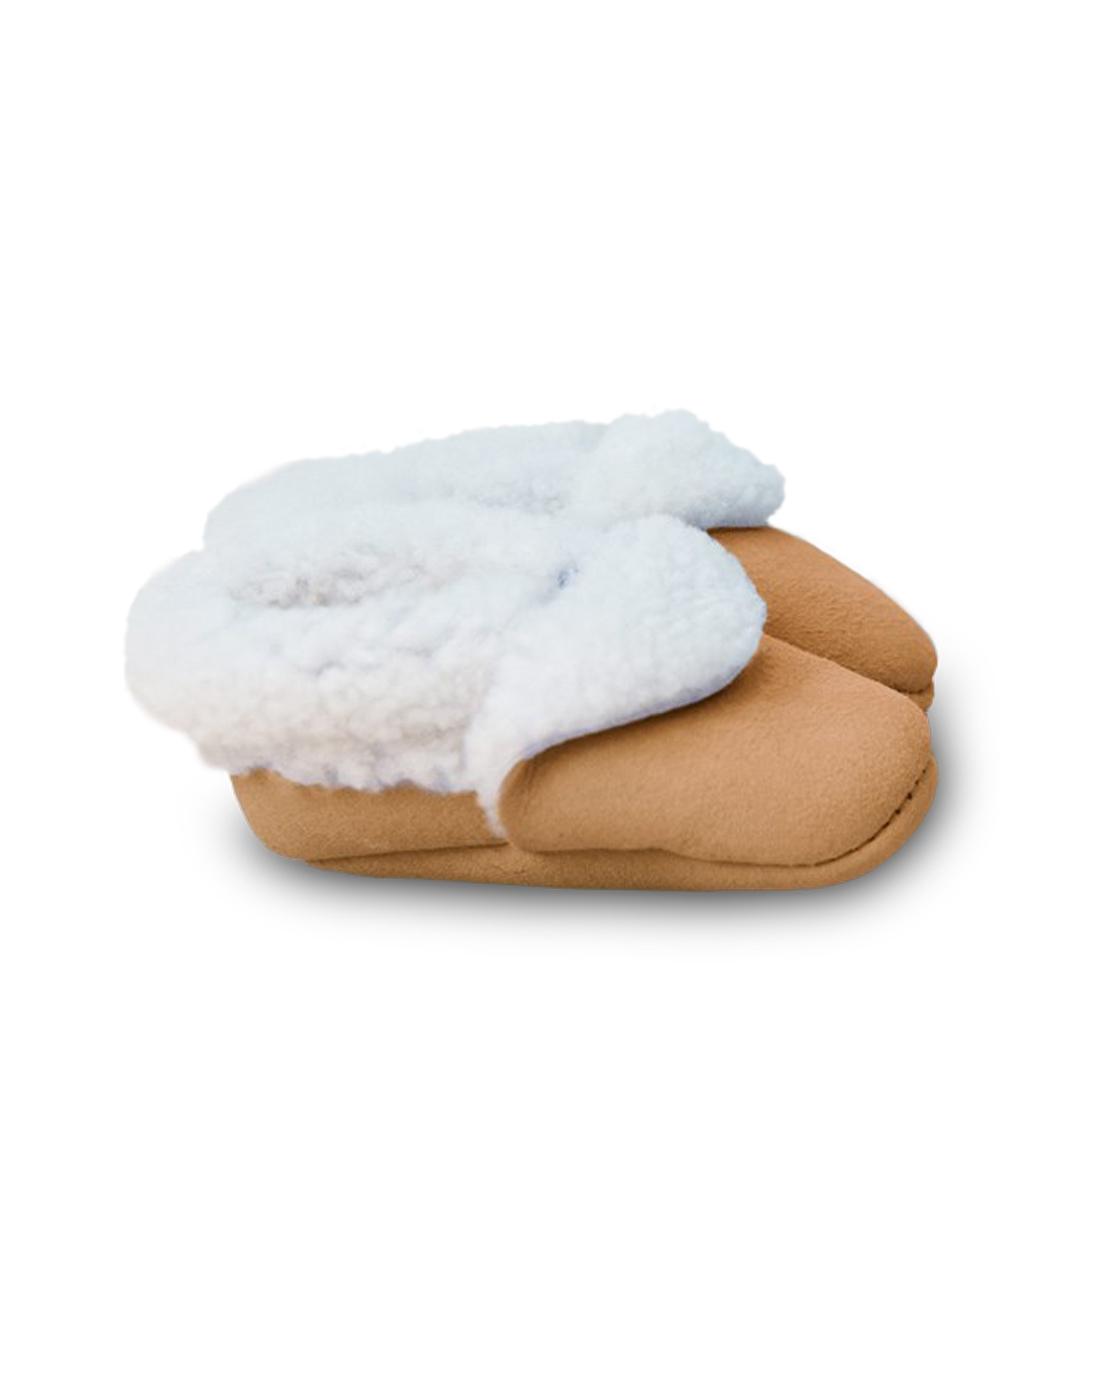 Sheepskin Baby Pram Shoes